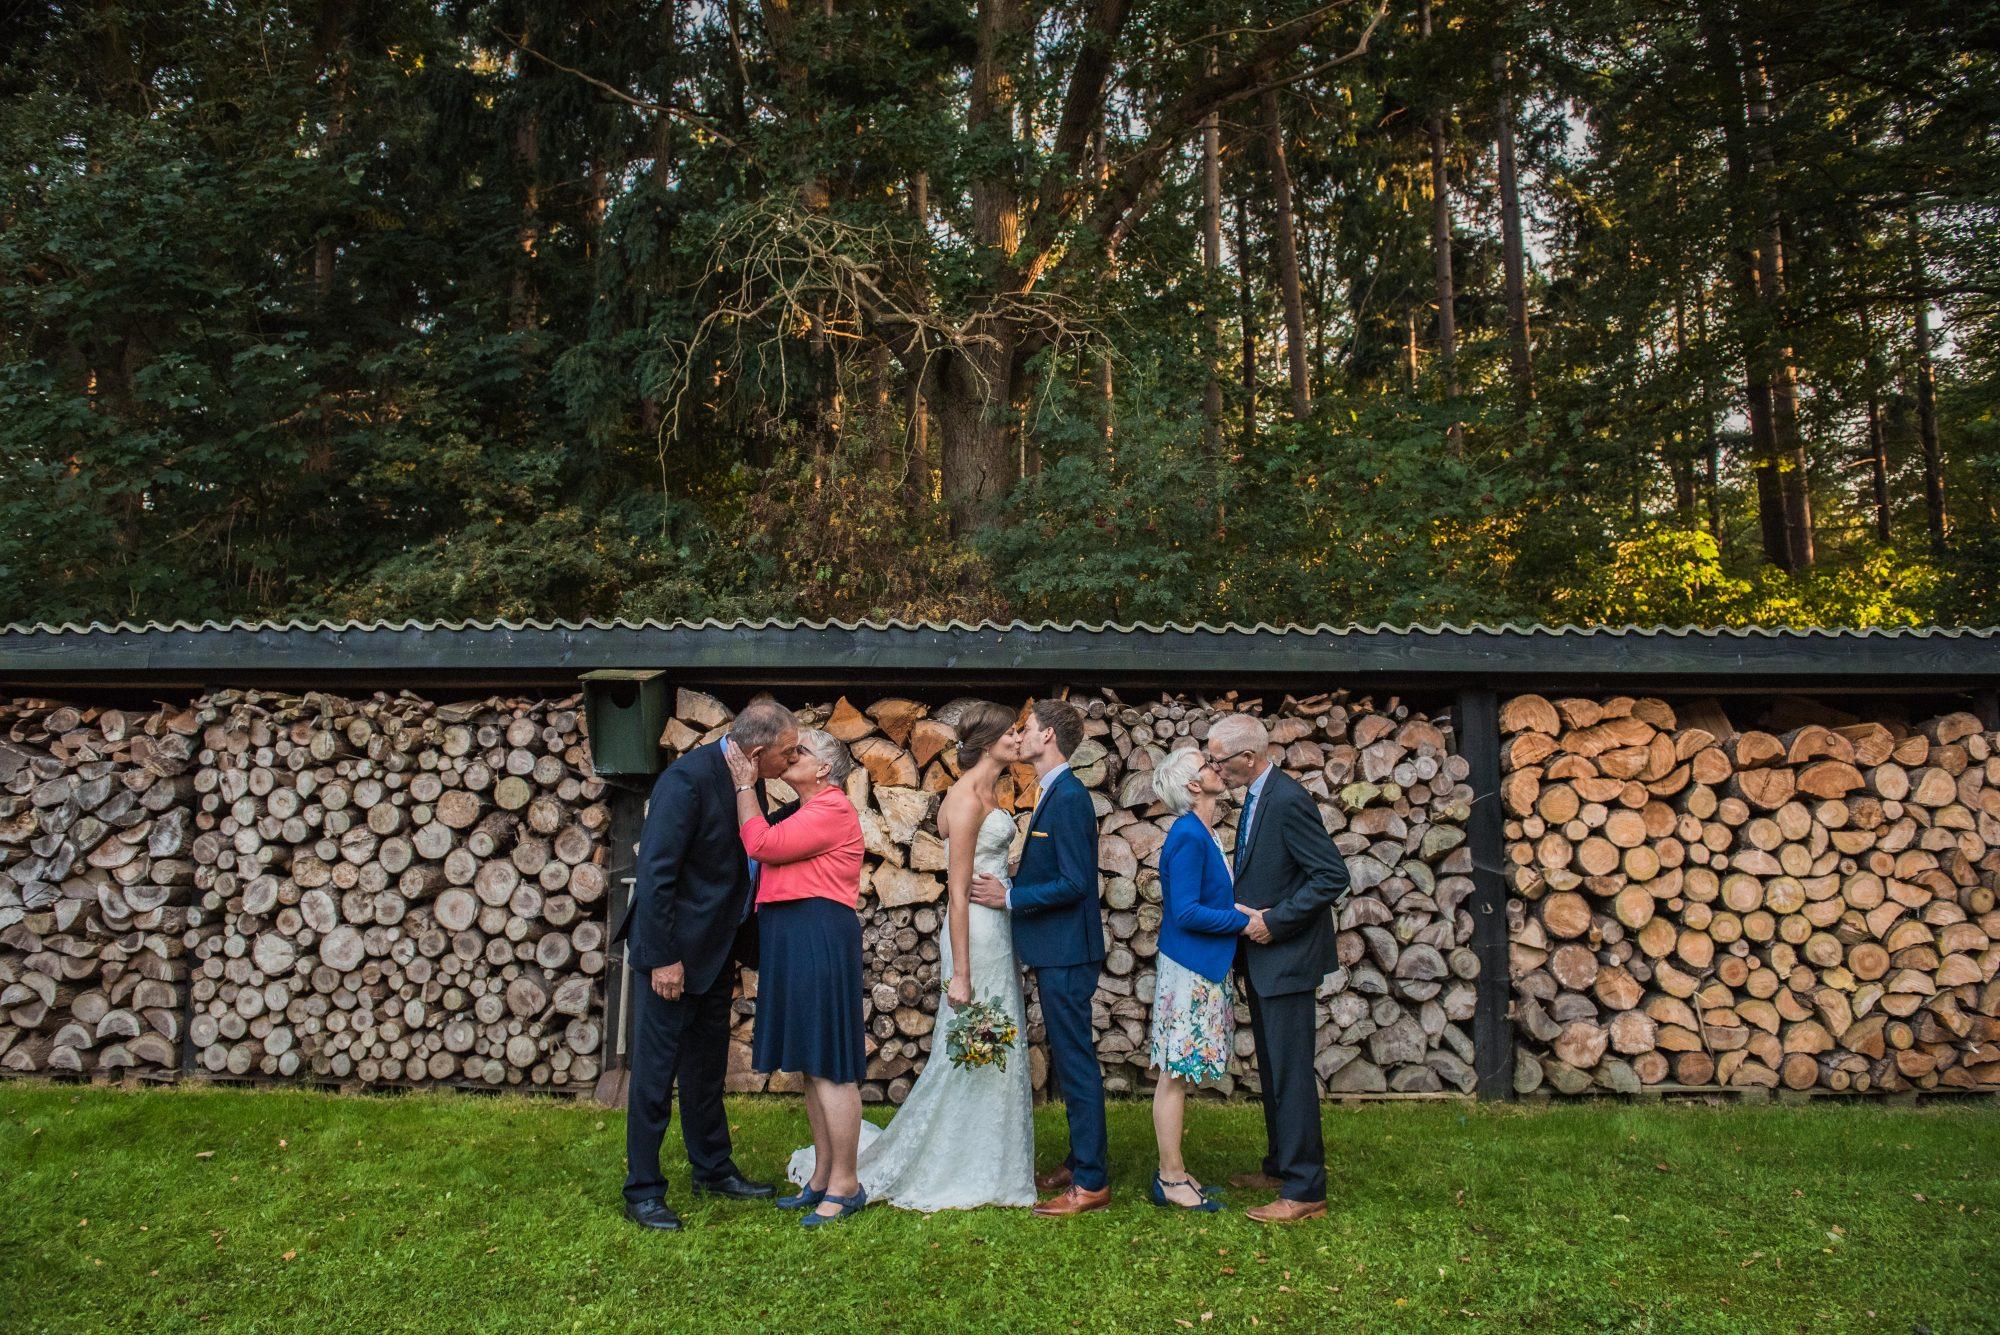 bruiloft-roland-annewil-637